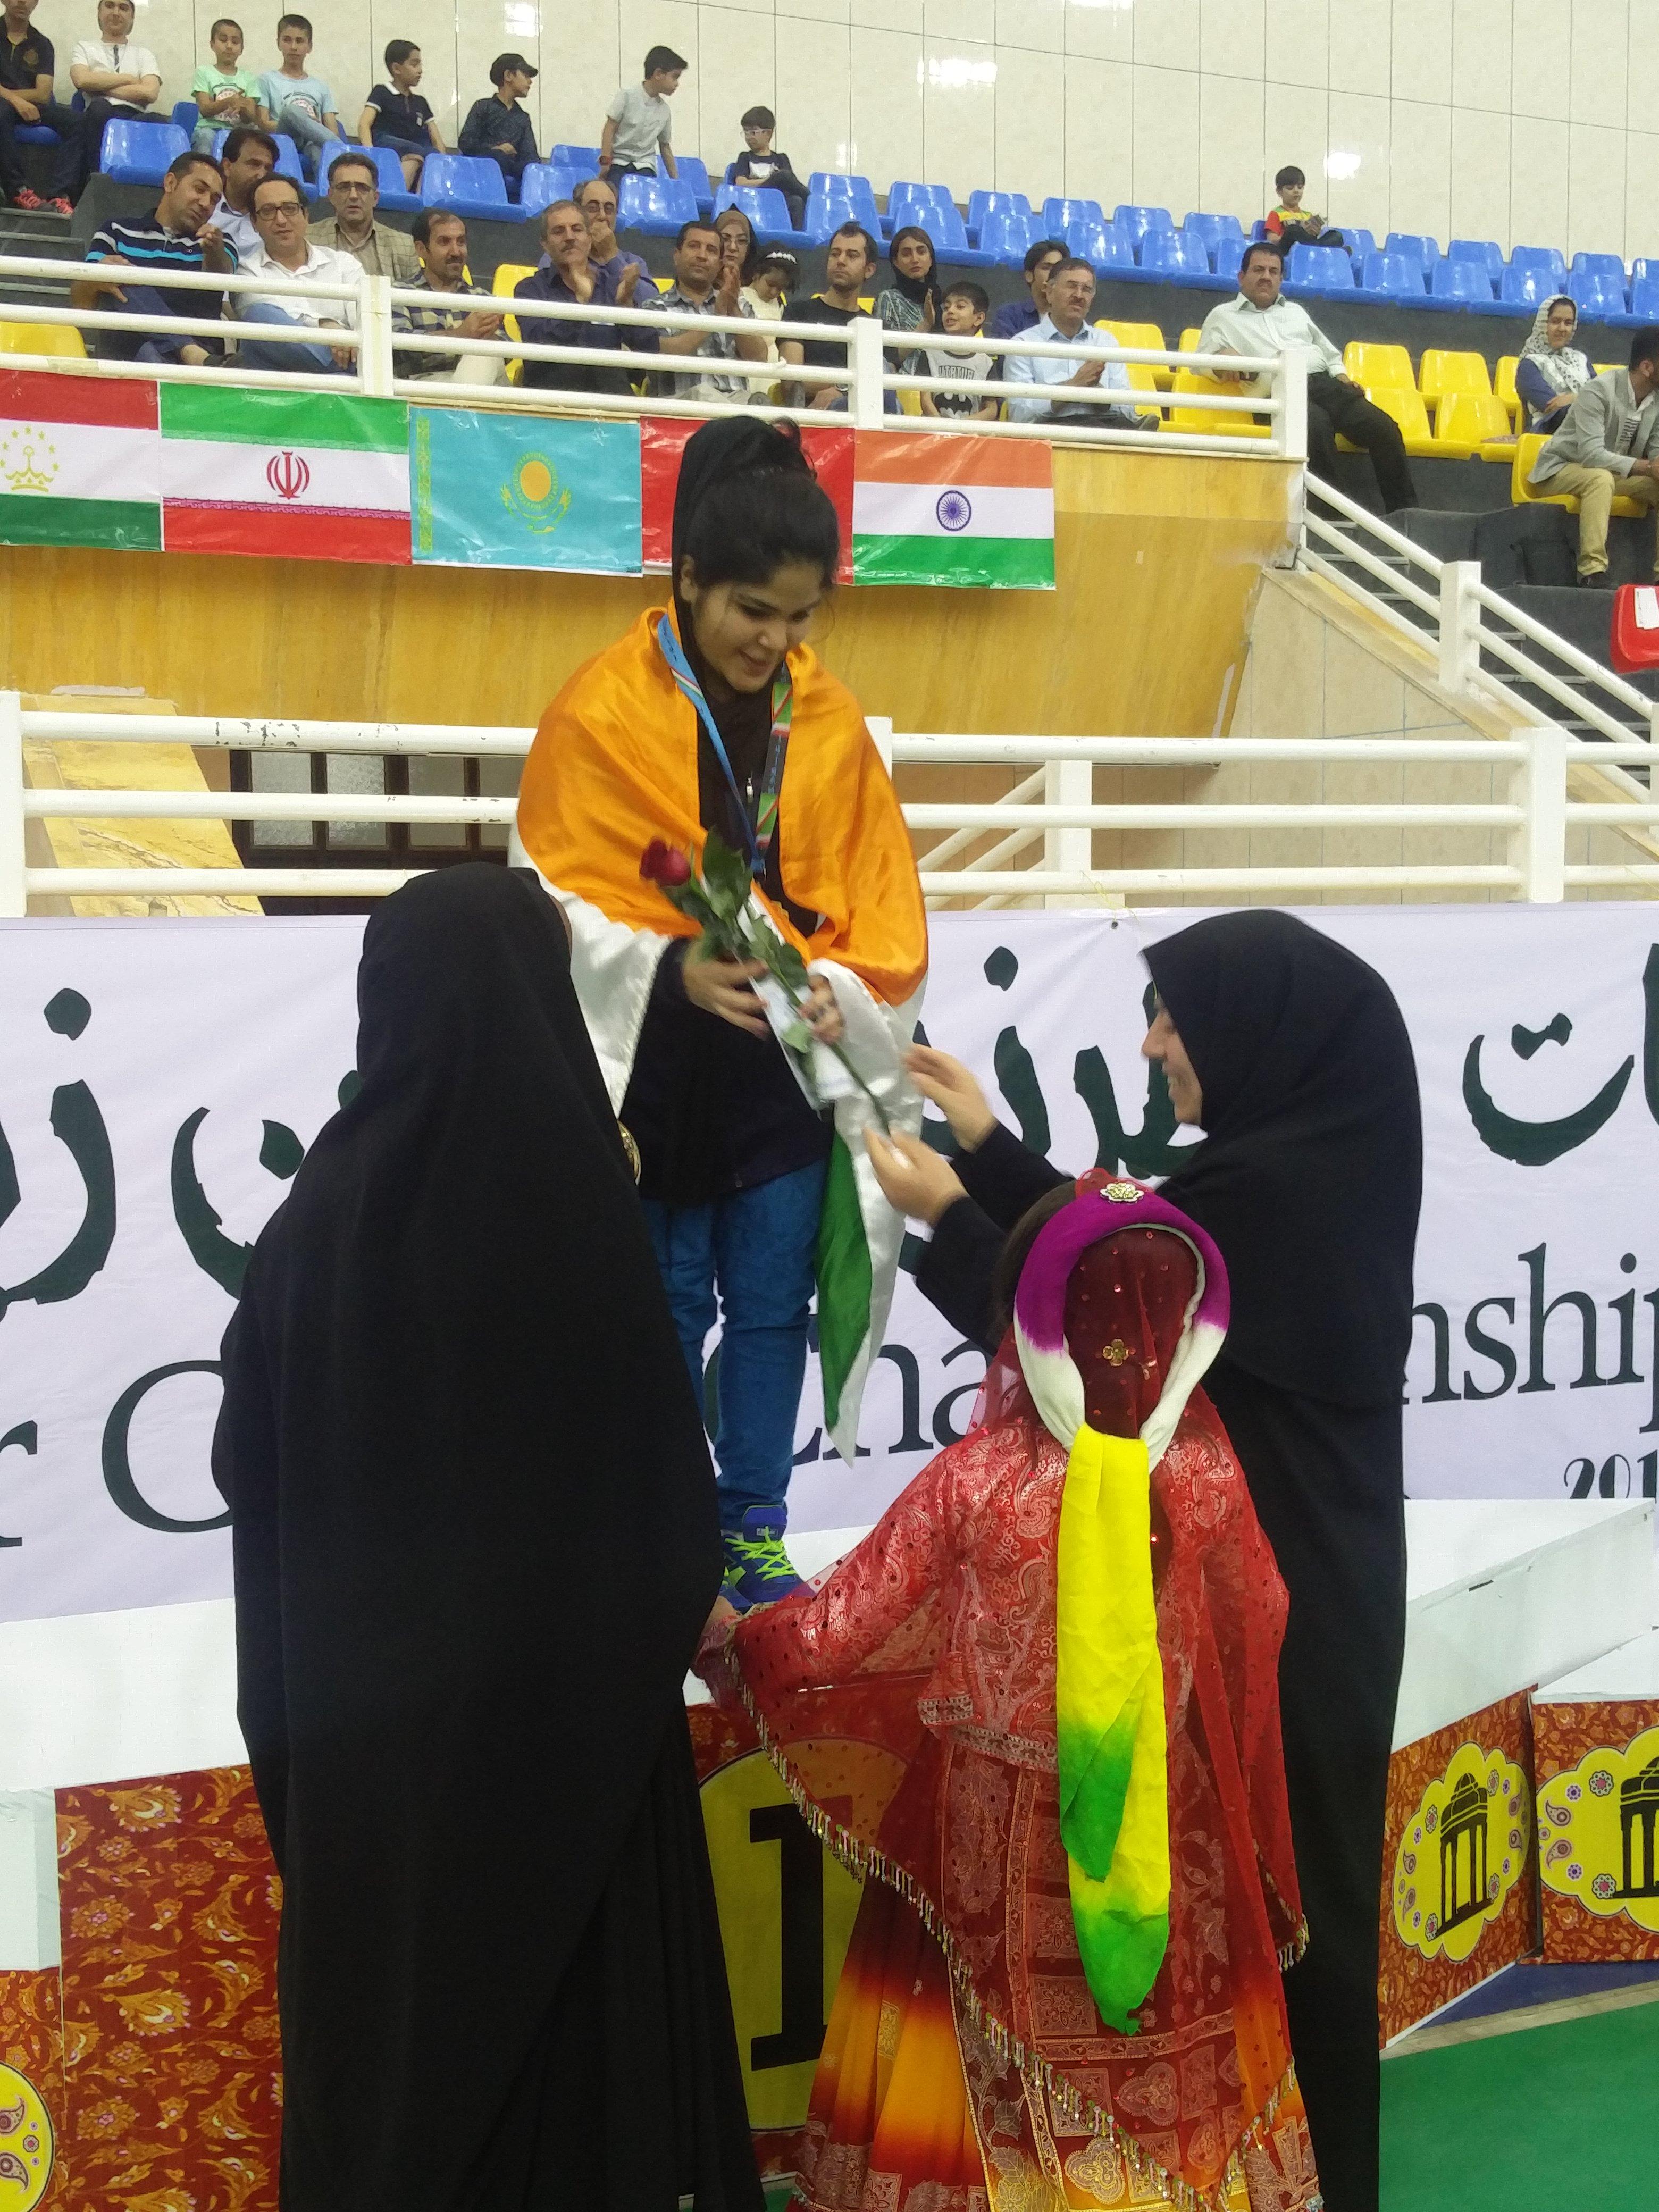 ivana-receiving-gold-medal-1